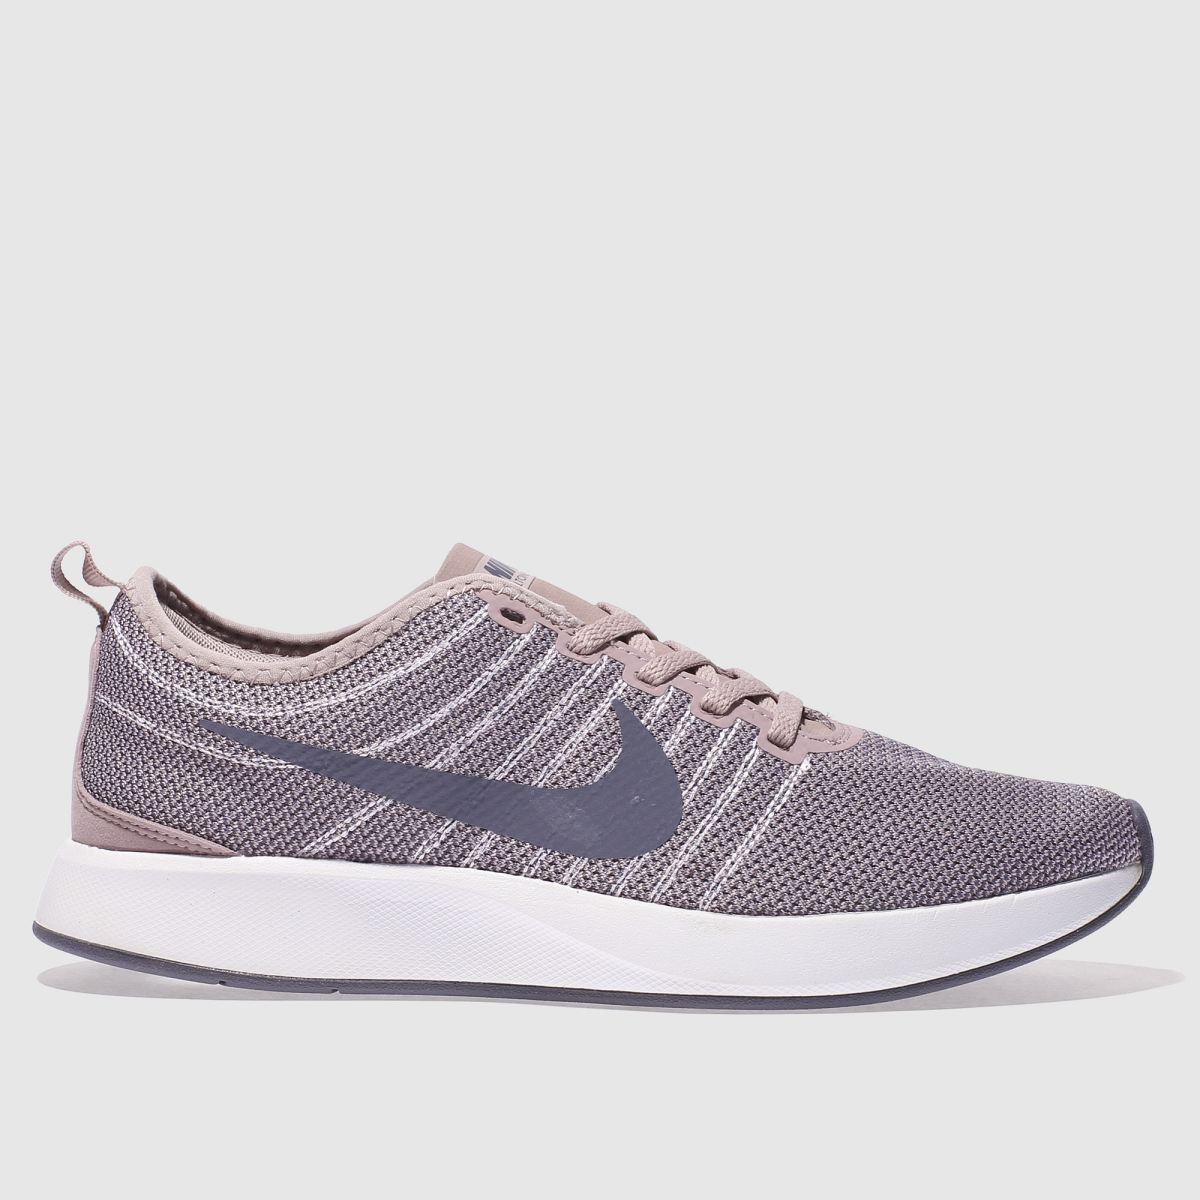 Nike Lilac Dualtone Trainers